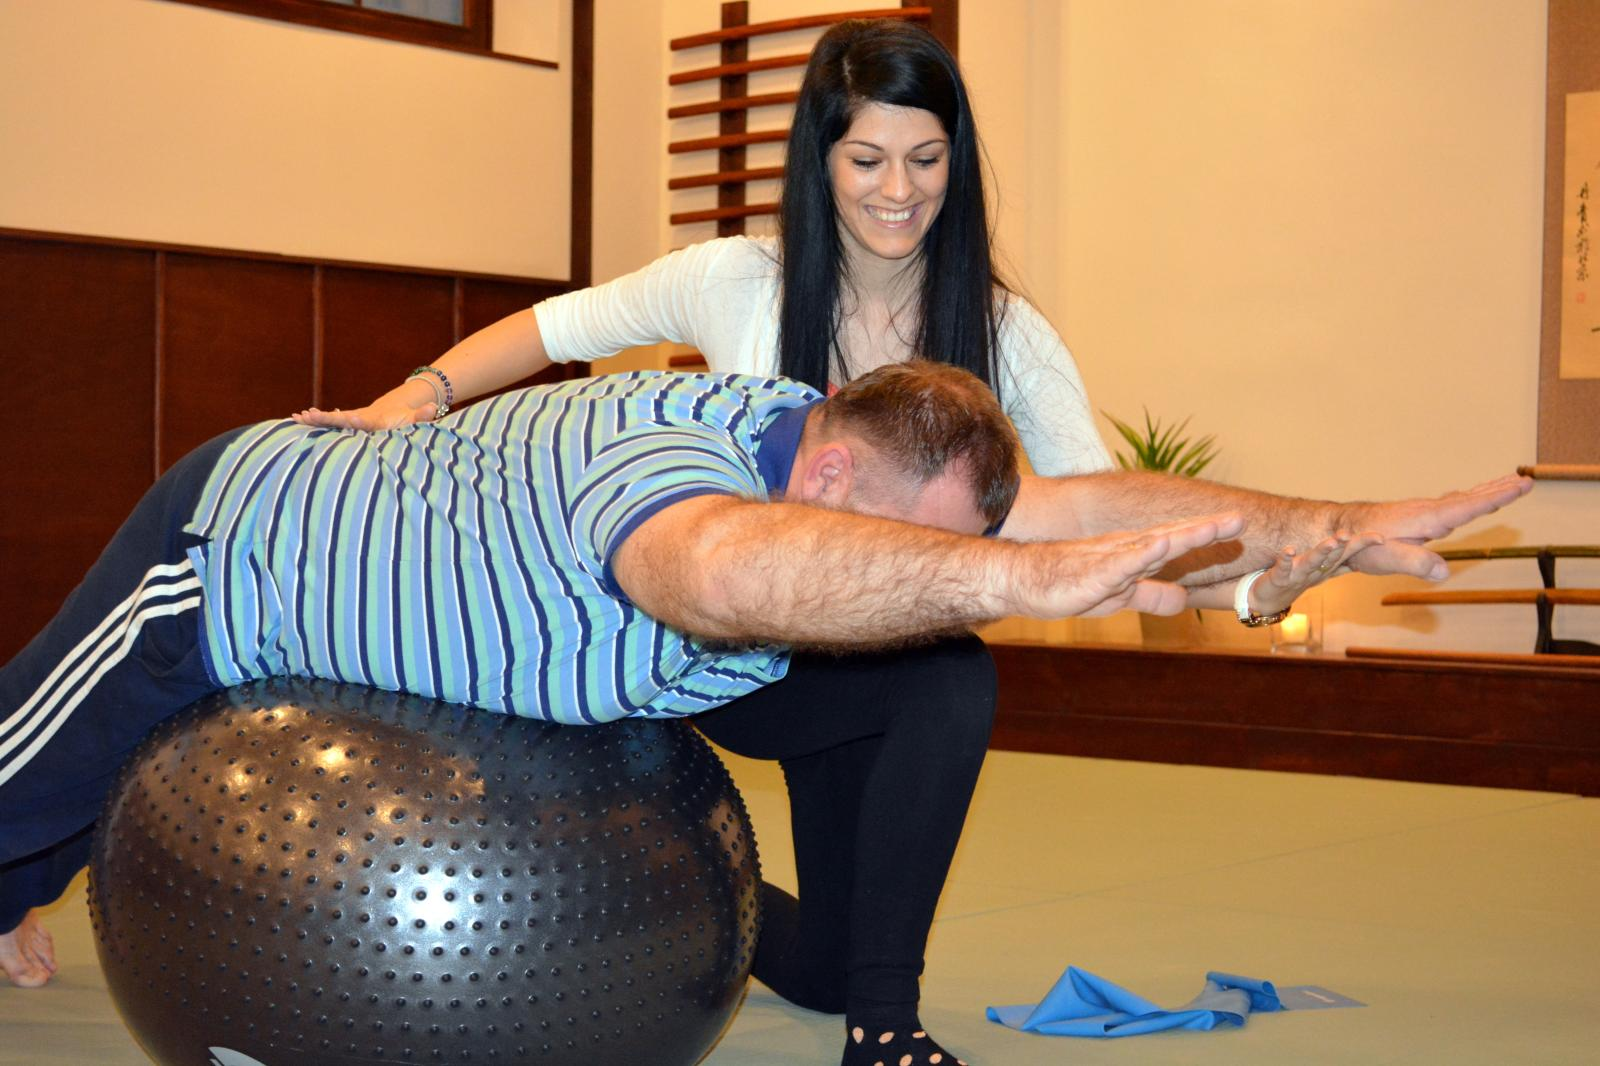 Új! Gerinctorna és stretching - Aikido Tada Ima Dojo és Rekreációs Központ, Esztergom